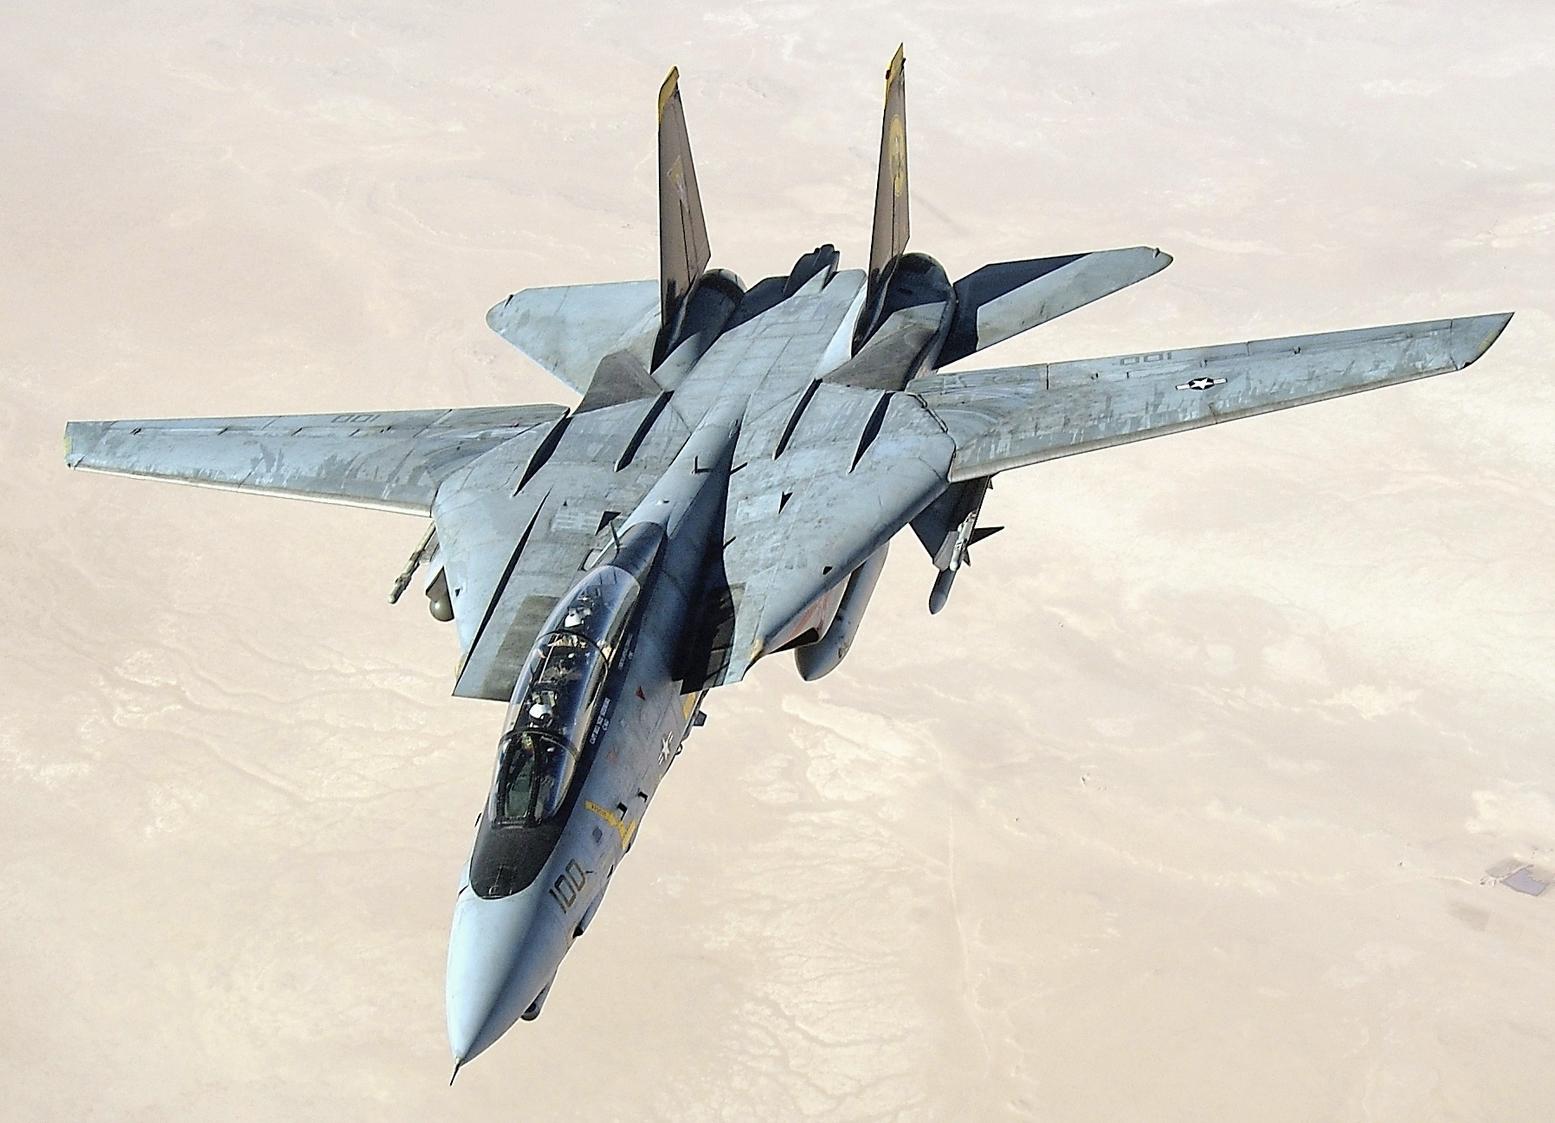 The Grumman F-14A/B/D Tomcat - cover